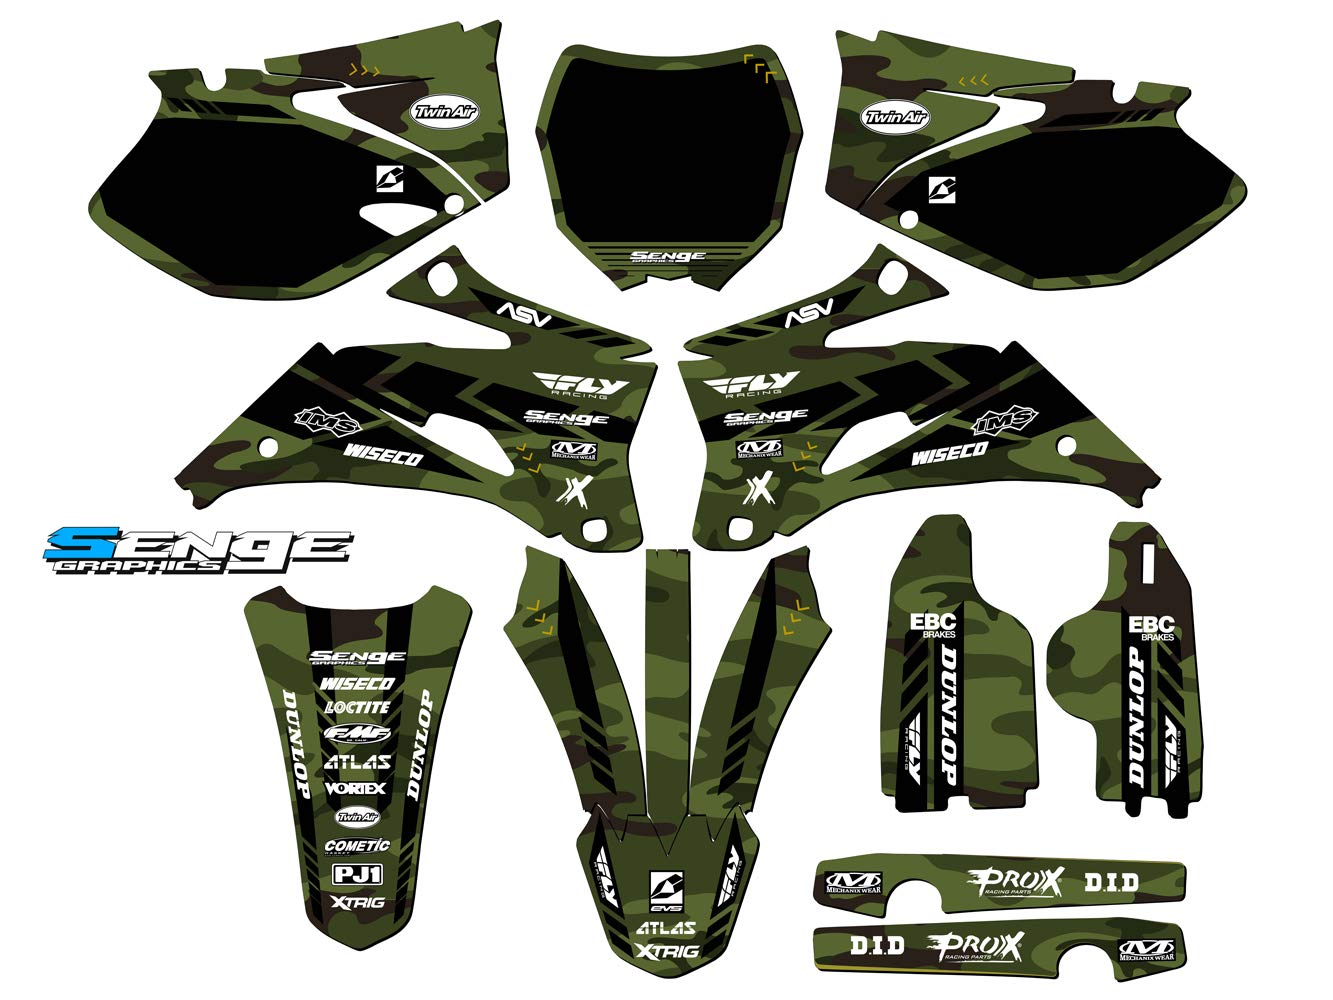 Senge Graphics kit compatible with Yamaha 2006-2007 YZ 450F/250F (4-Stroke), Apache Matte Green (MATTE FINISH) Complete Graphics Kit